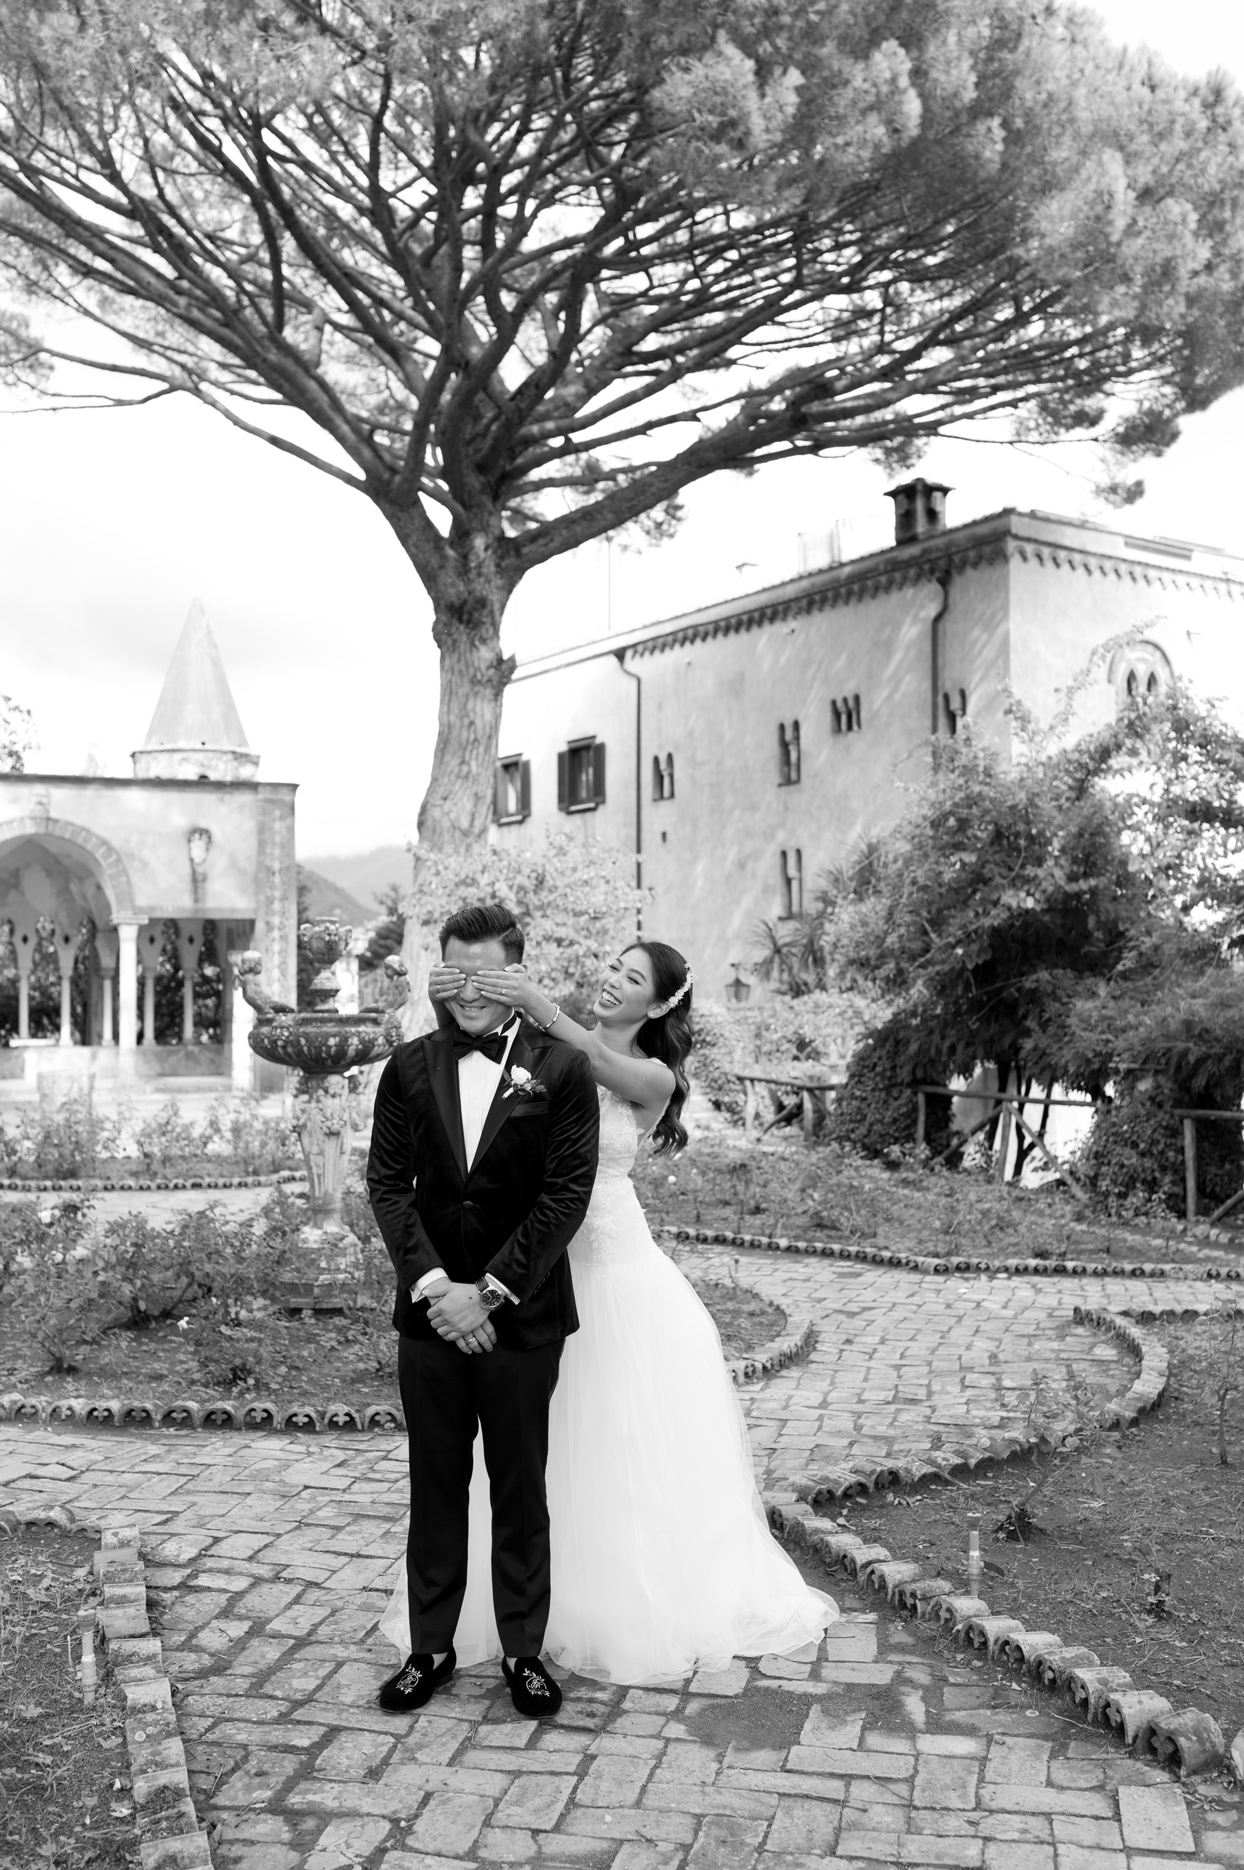 bride stands behind groom covering his eyes before first look